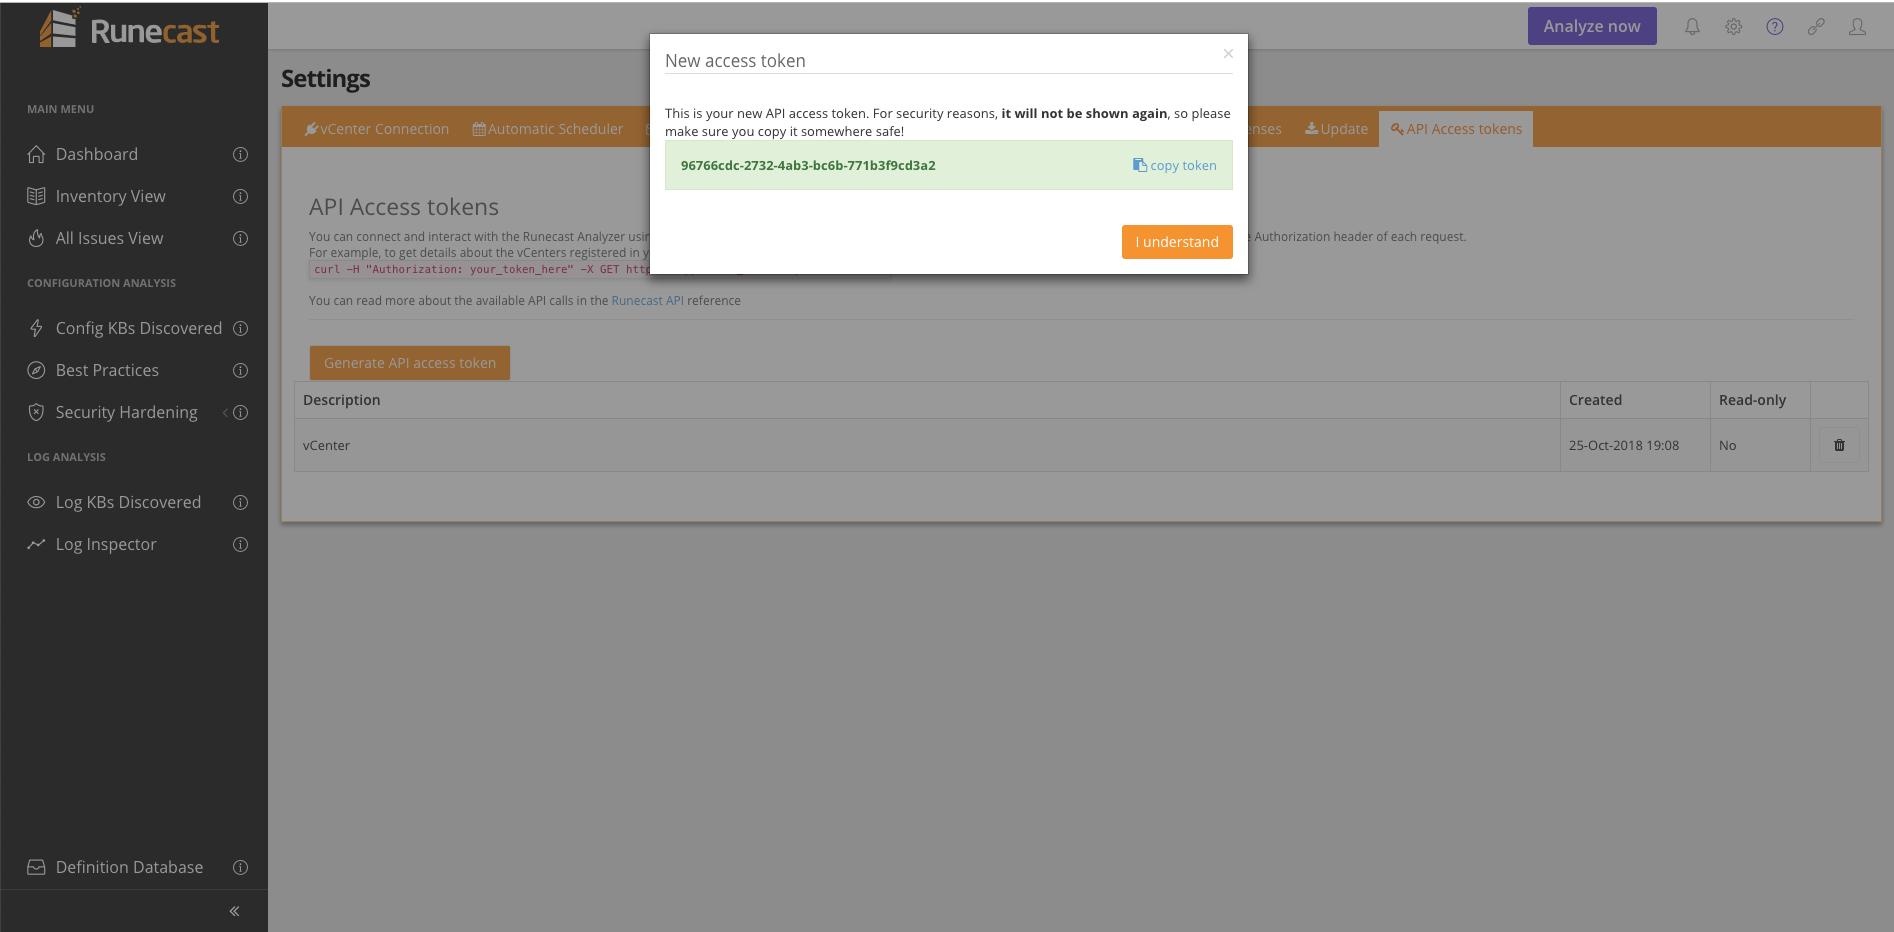 Health check your vSphere environment using Runecast Analyzer